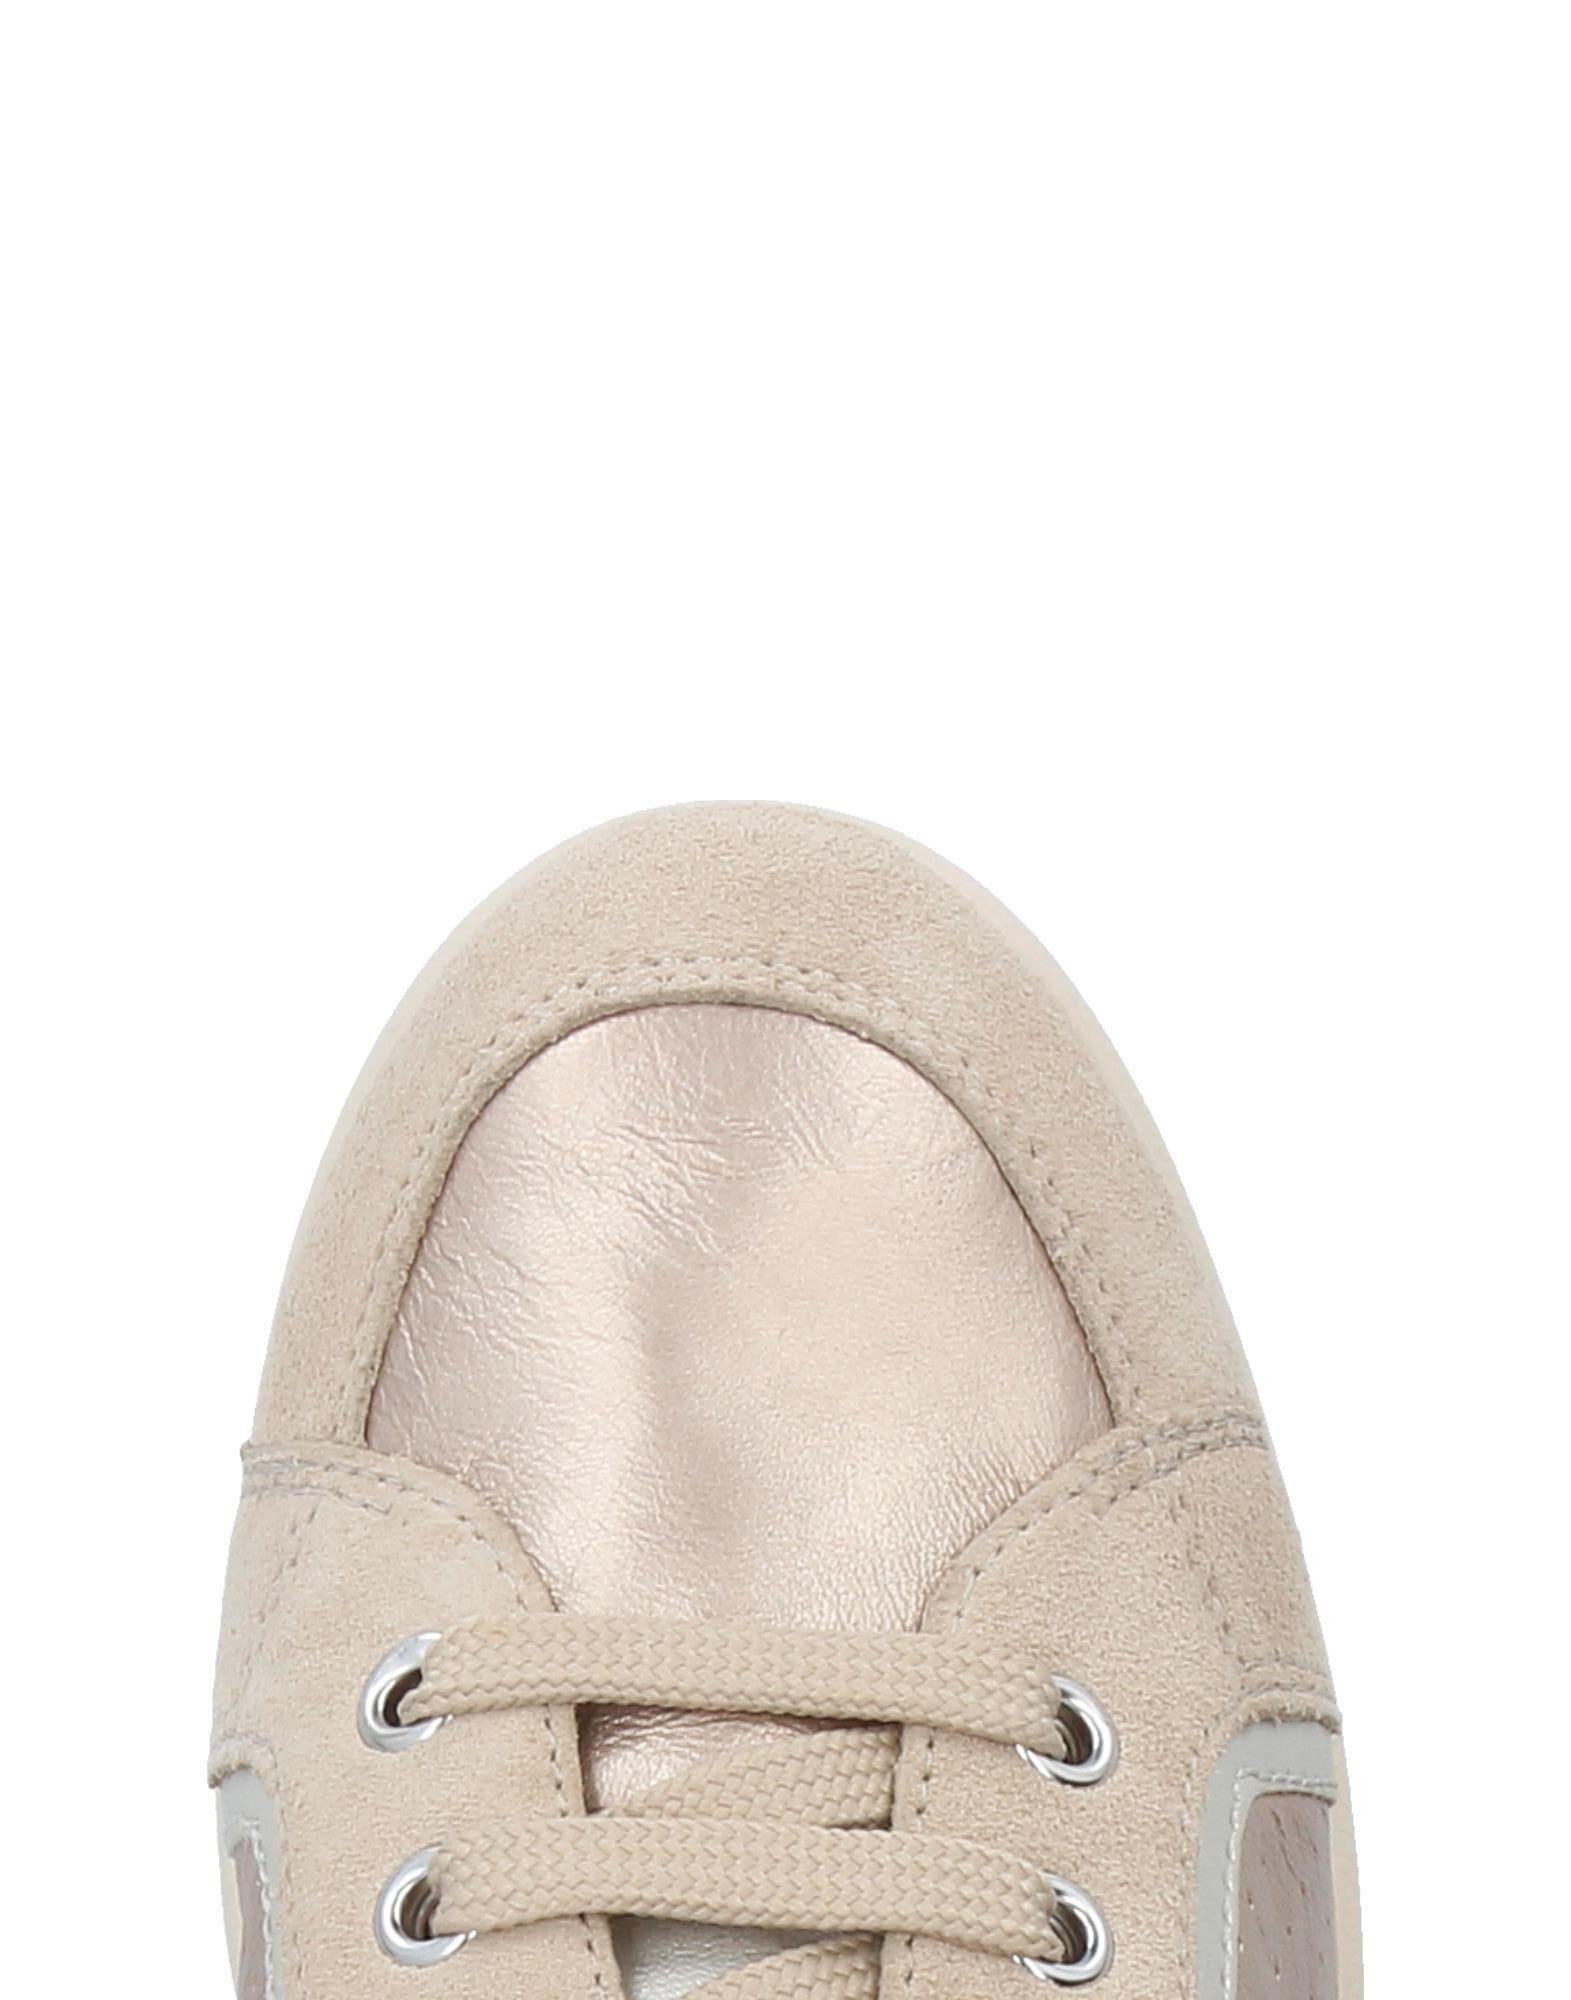 Haltbare Mode billige Schuhe Geox Geox Geox Sneakers Damen  11414062RK Heiße Schuhe c5839c